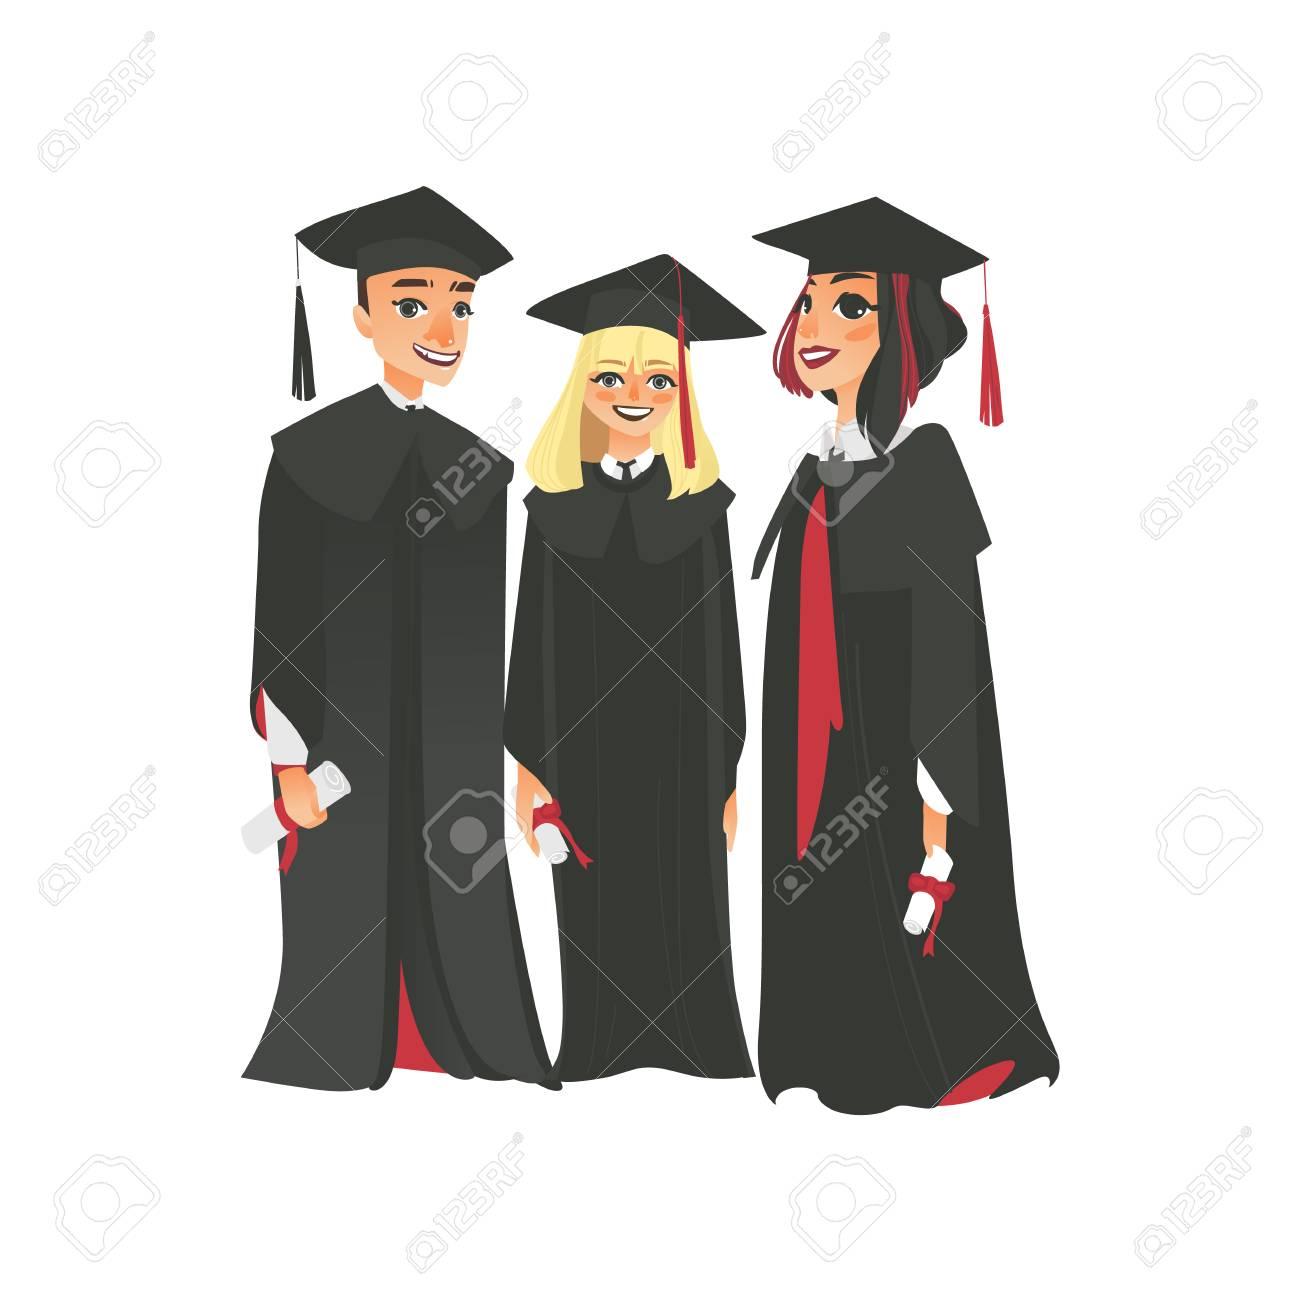 Group Of Three Happy College Graduates In Graduation Cap And ...